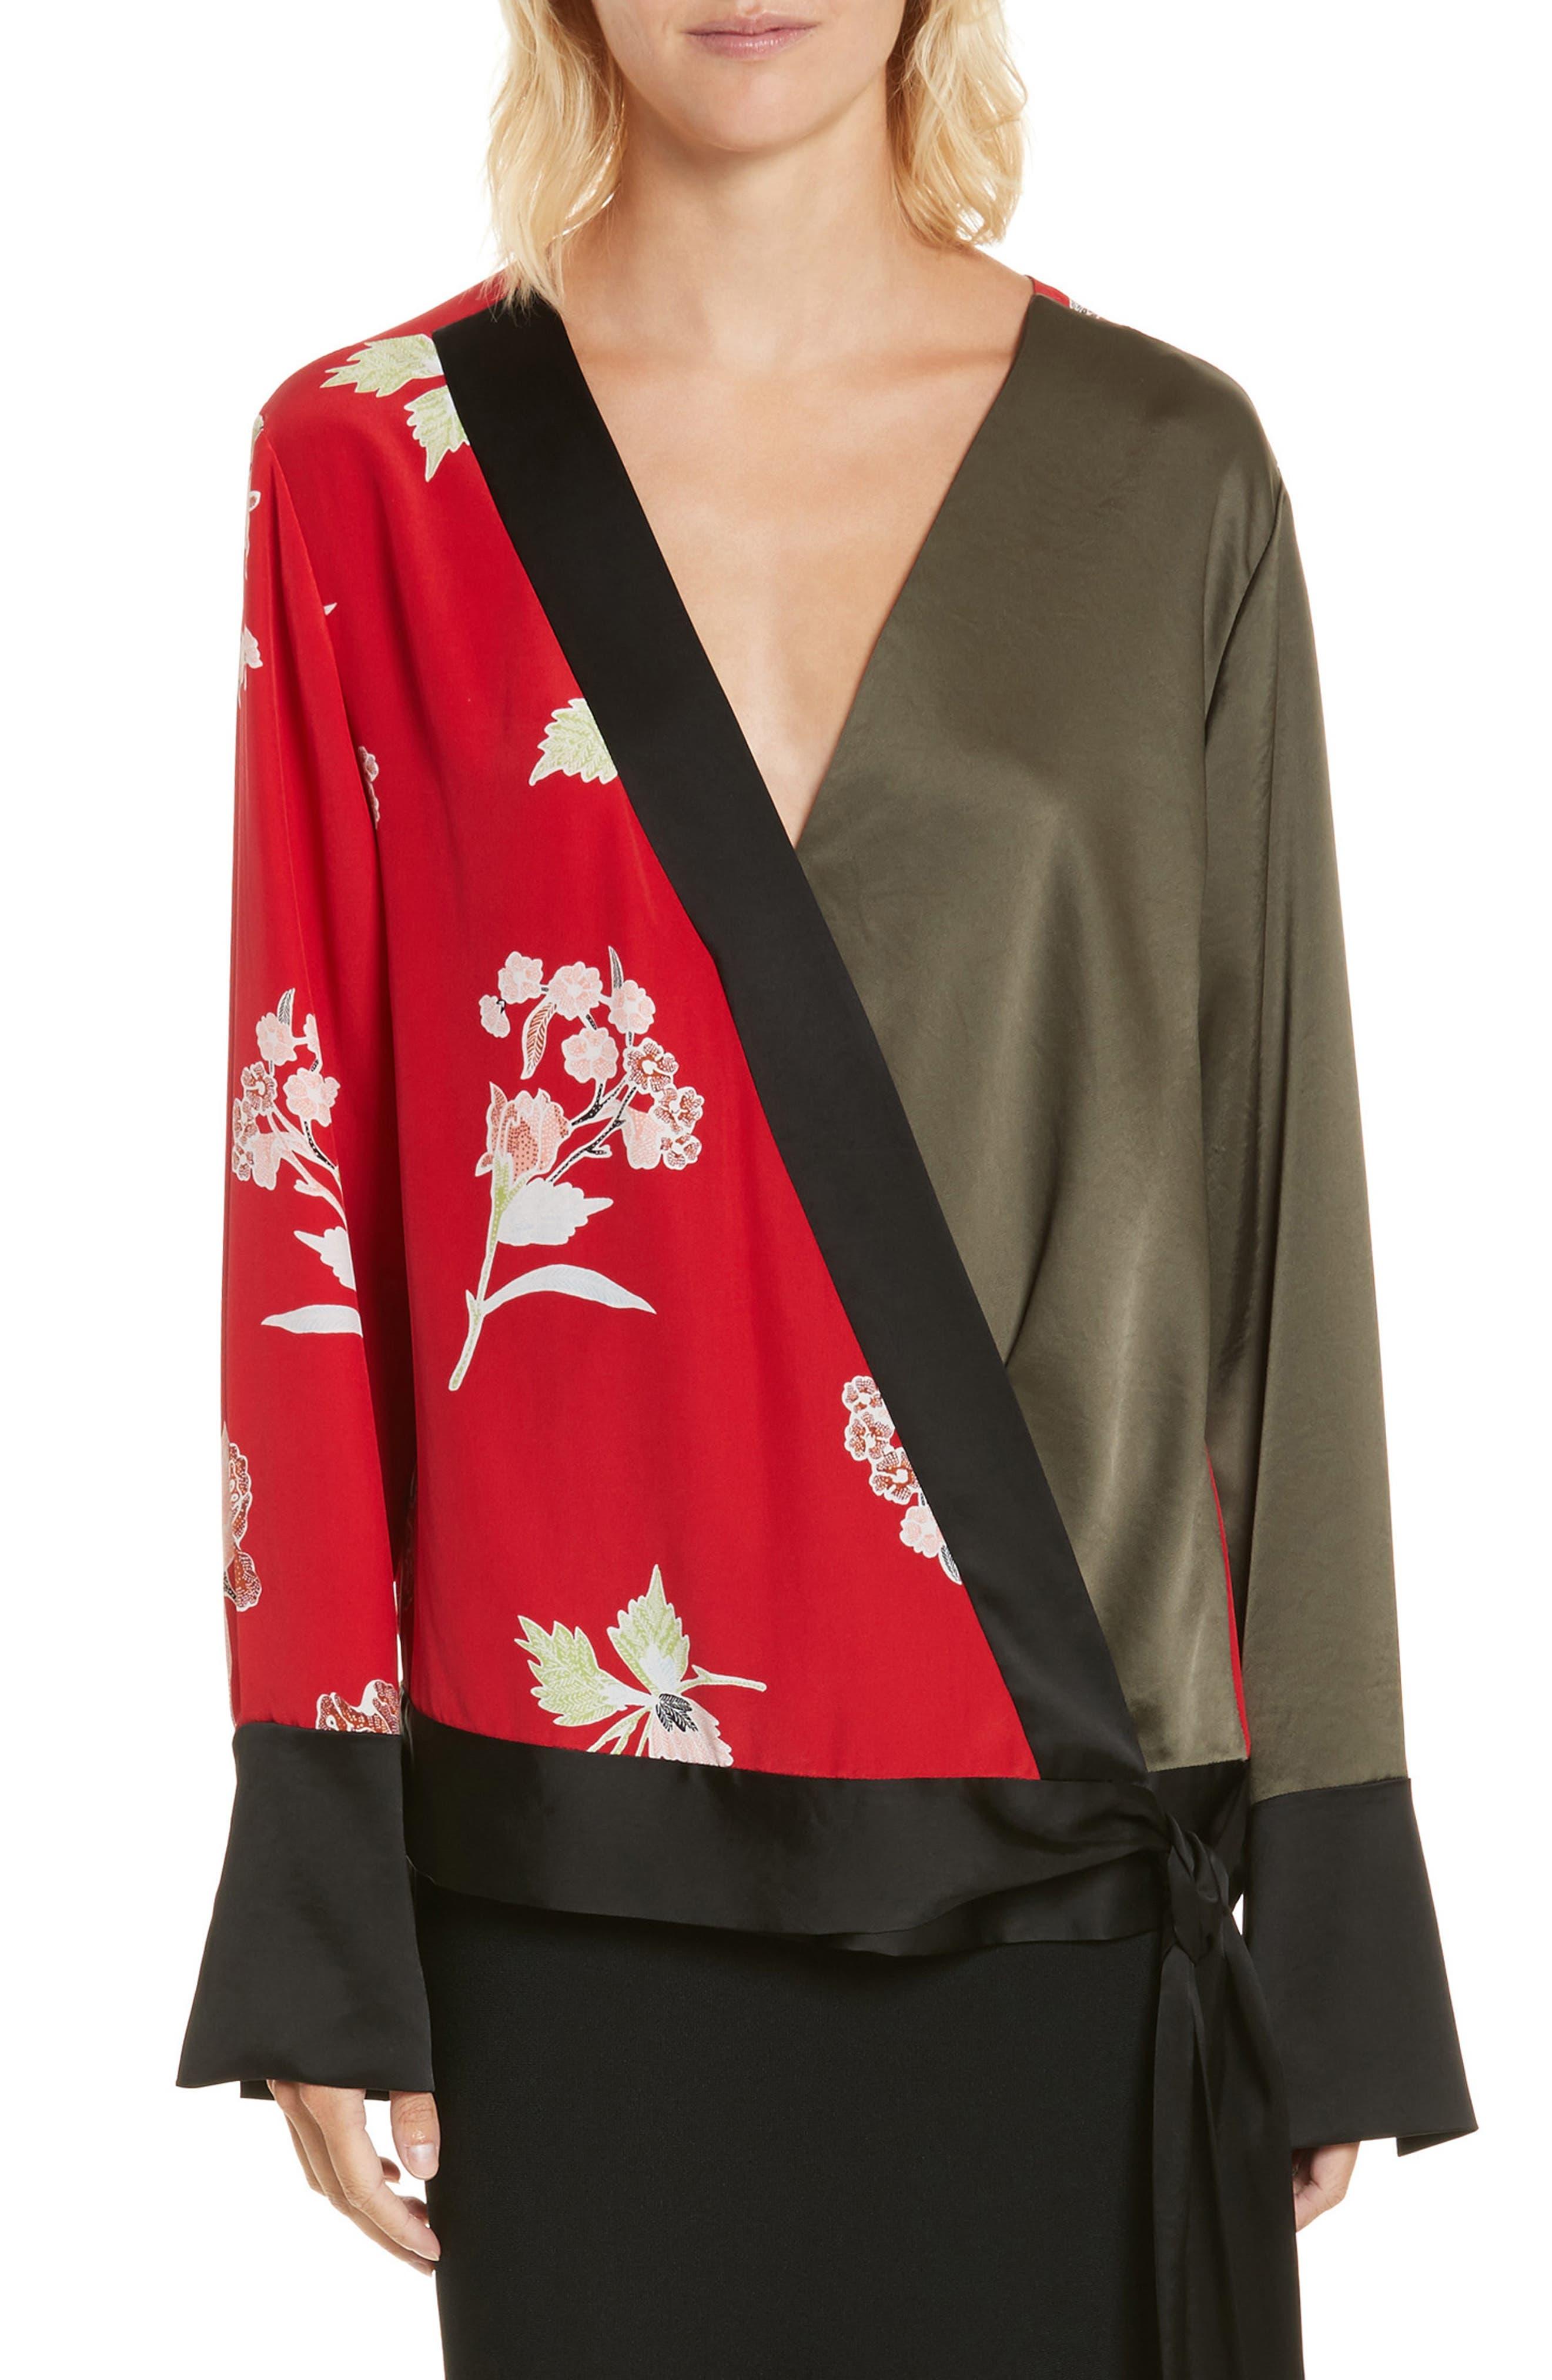 Diane von Furstenberg Bell Sleeve Crossover Silk Blouse,                             Main thumbnail 1, color,                             Everton Lipstick/ Olive